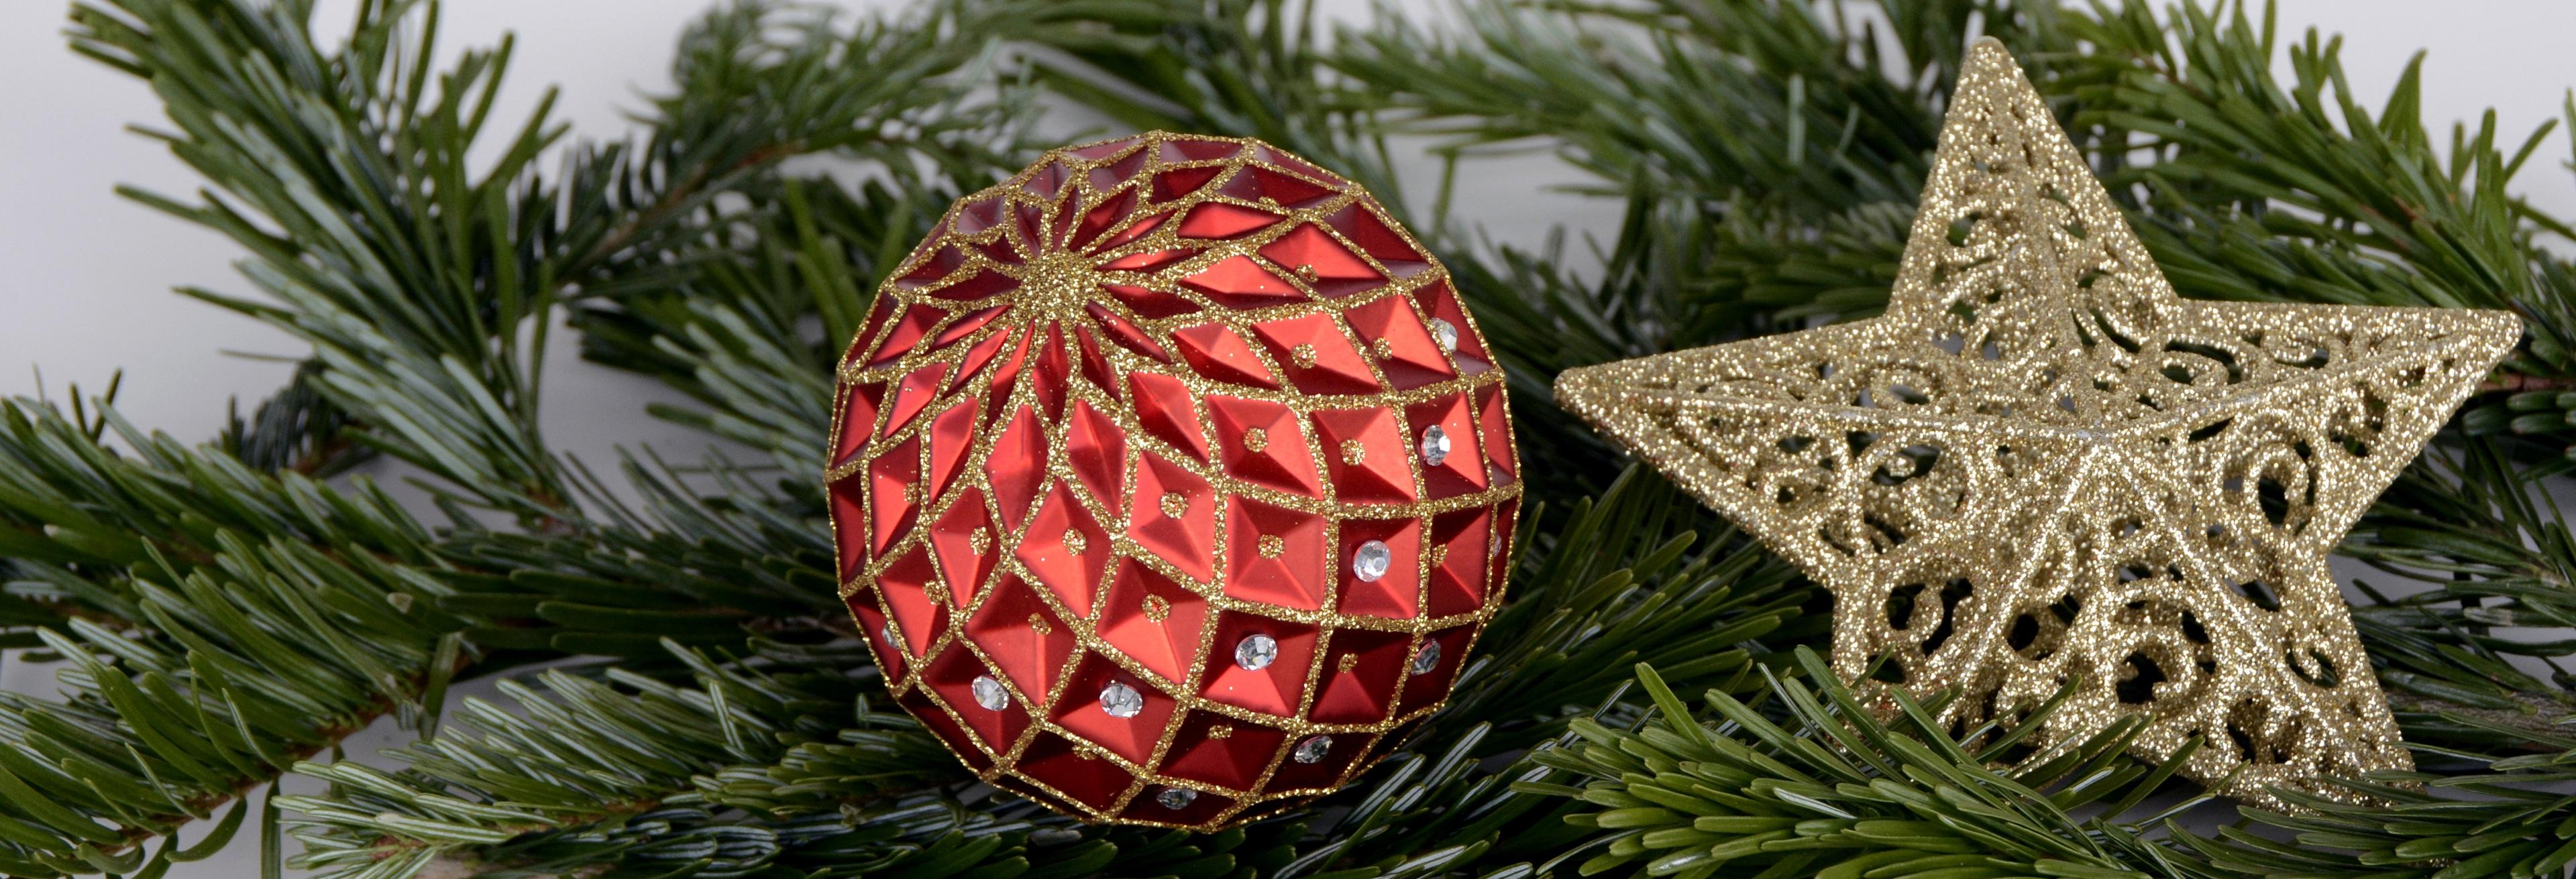 Modish Bildet : tre, gren, rød, gran, juletre, gnisten, deco, nåletre TY-06